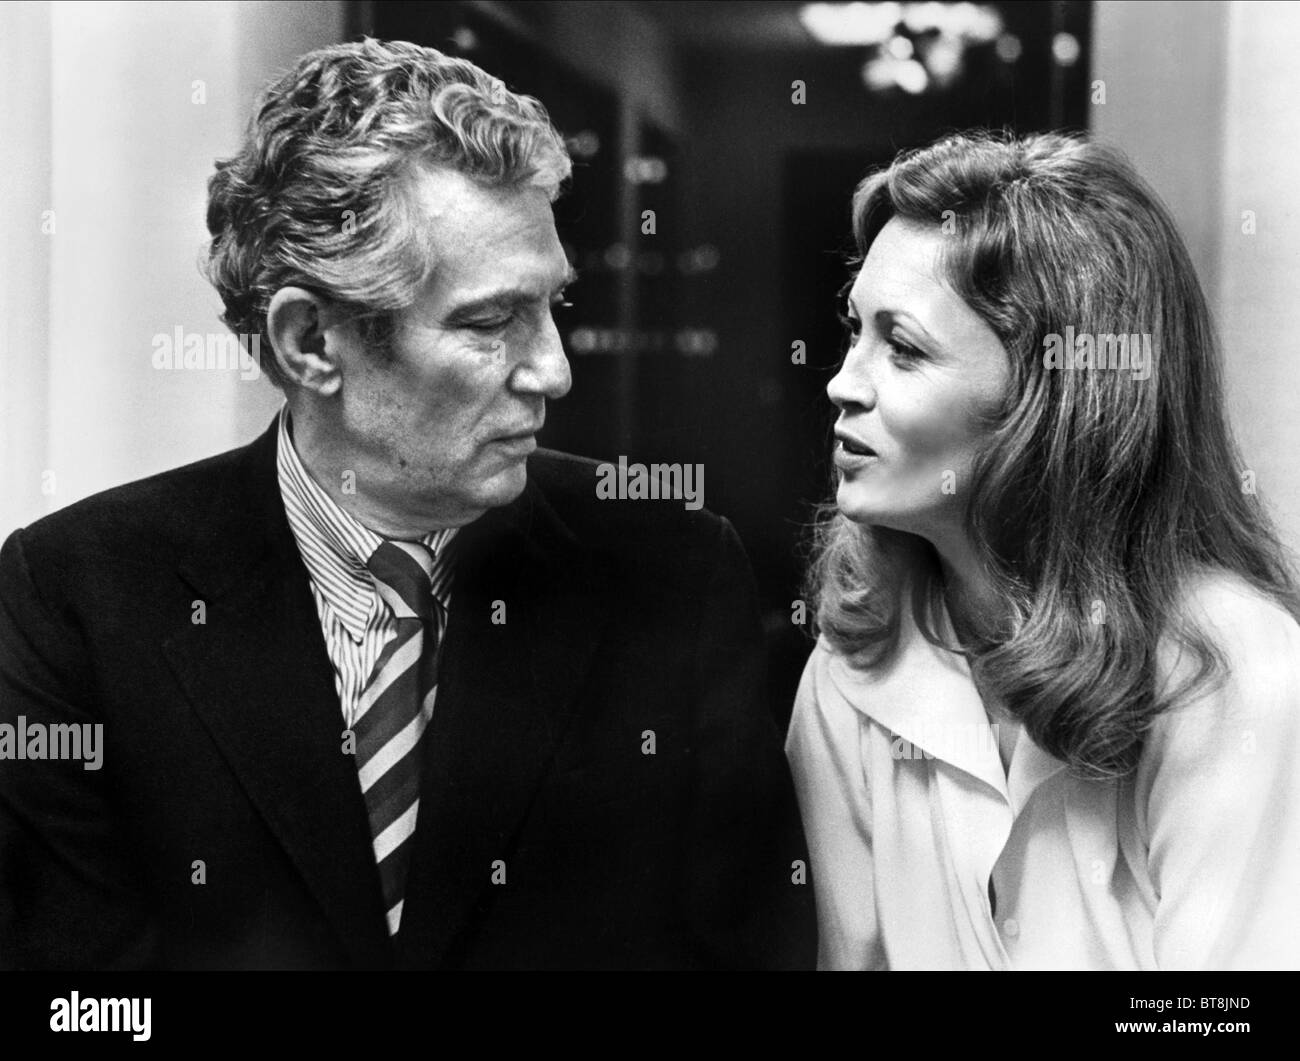 Faye dunaway network - Peter Finch Faye Dunaway Network 1976